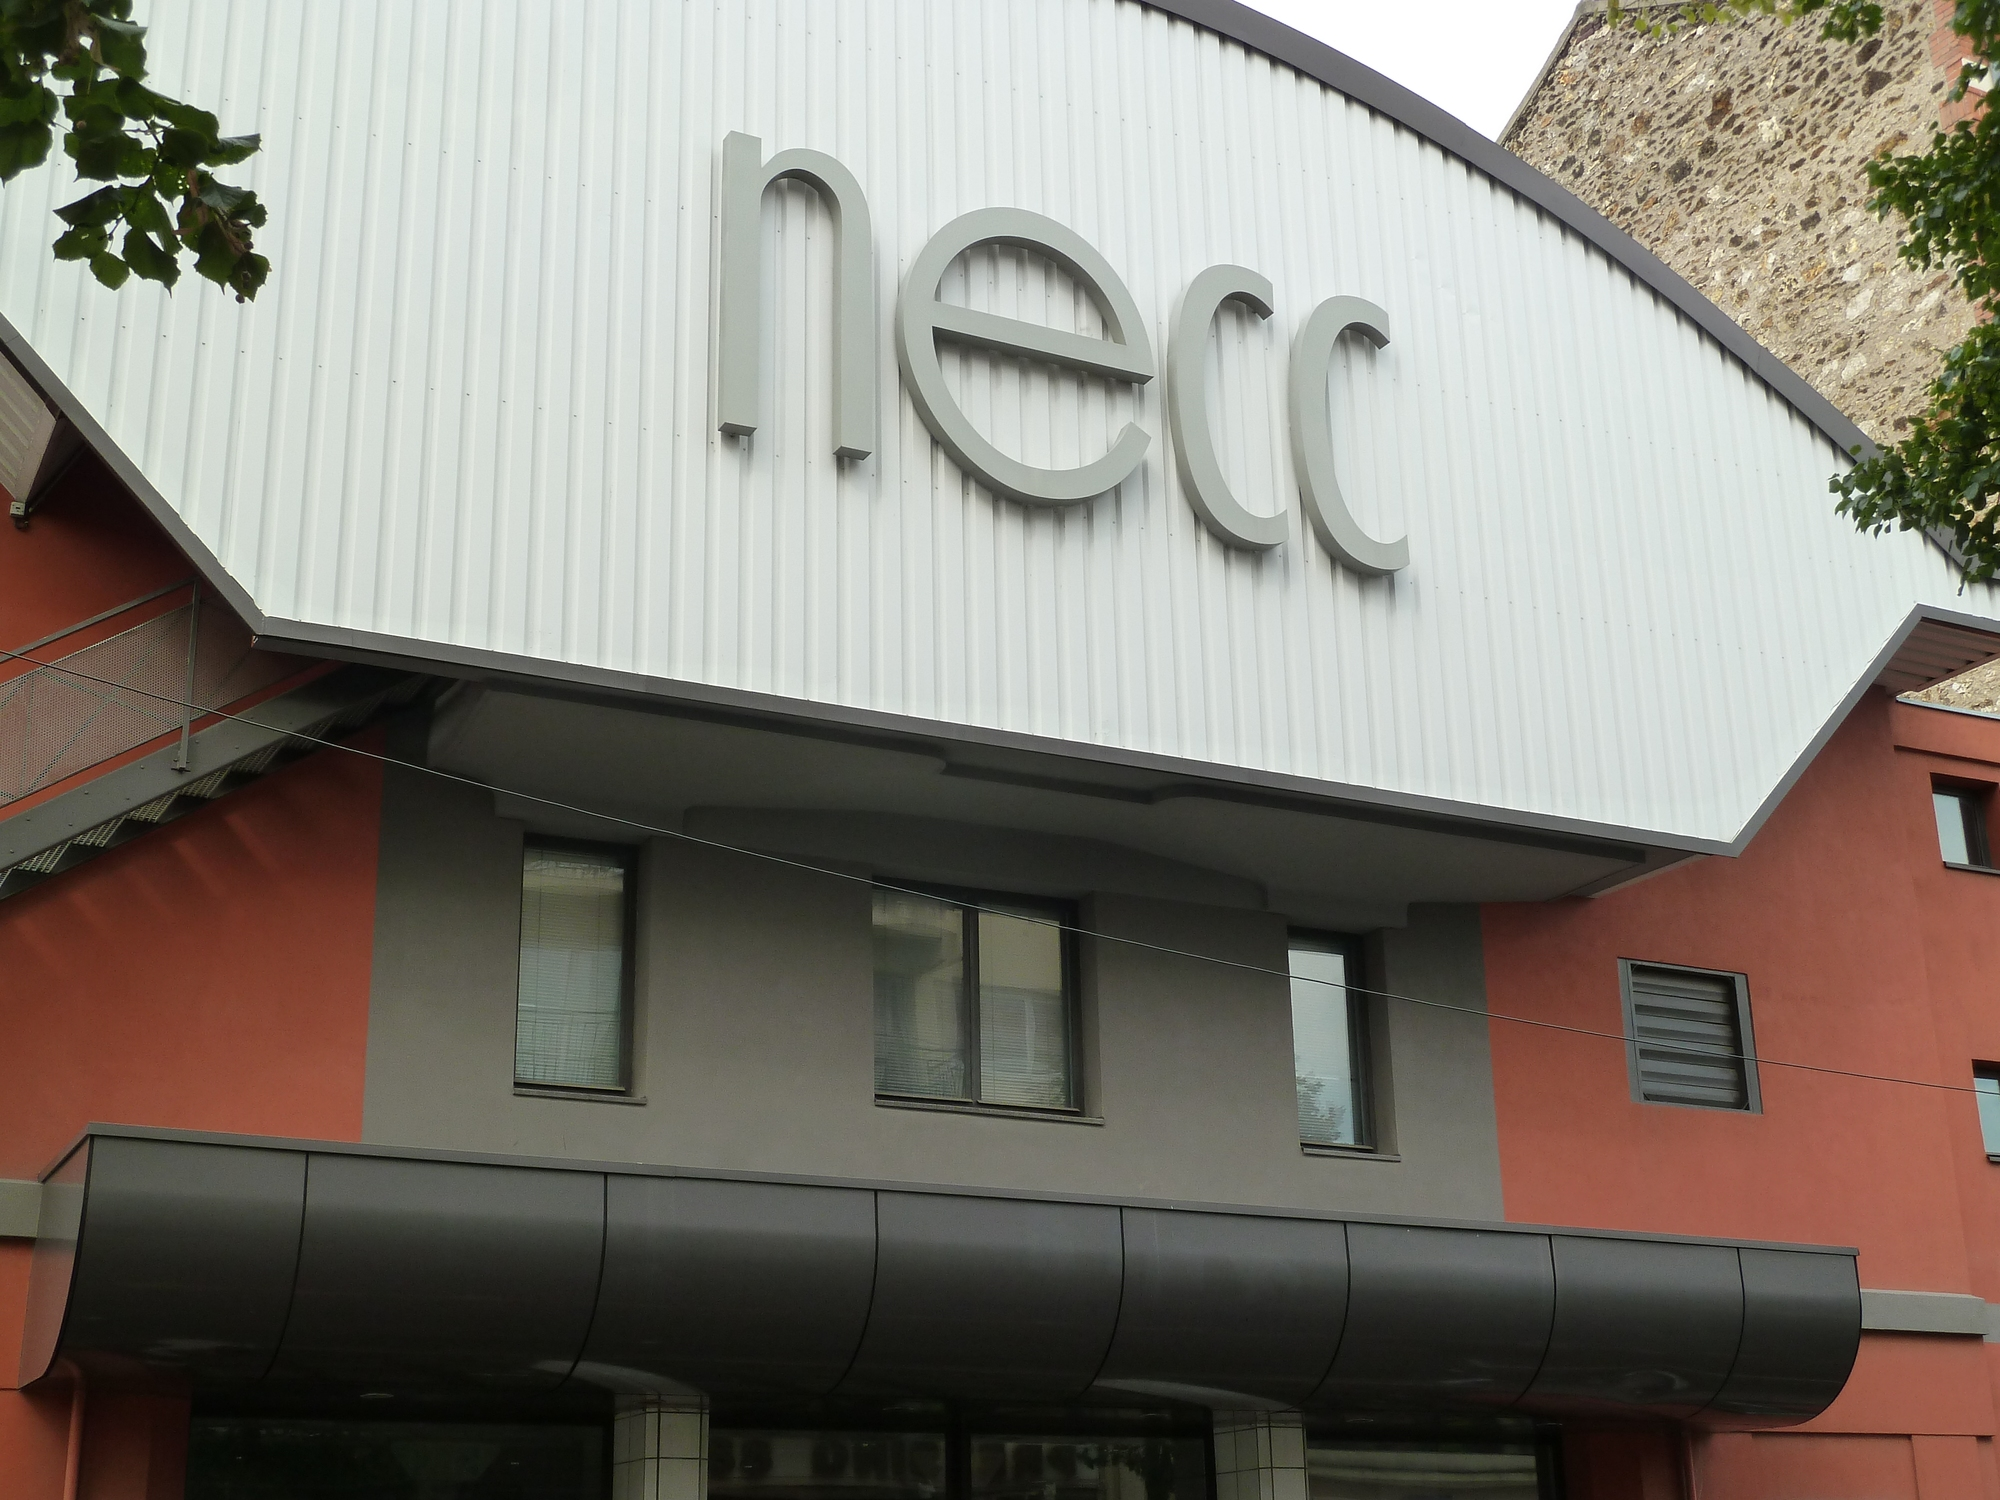 salle-necc-maisons-alfort-facade–1-